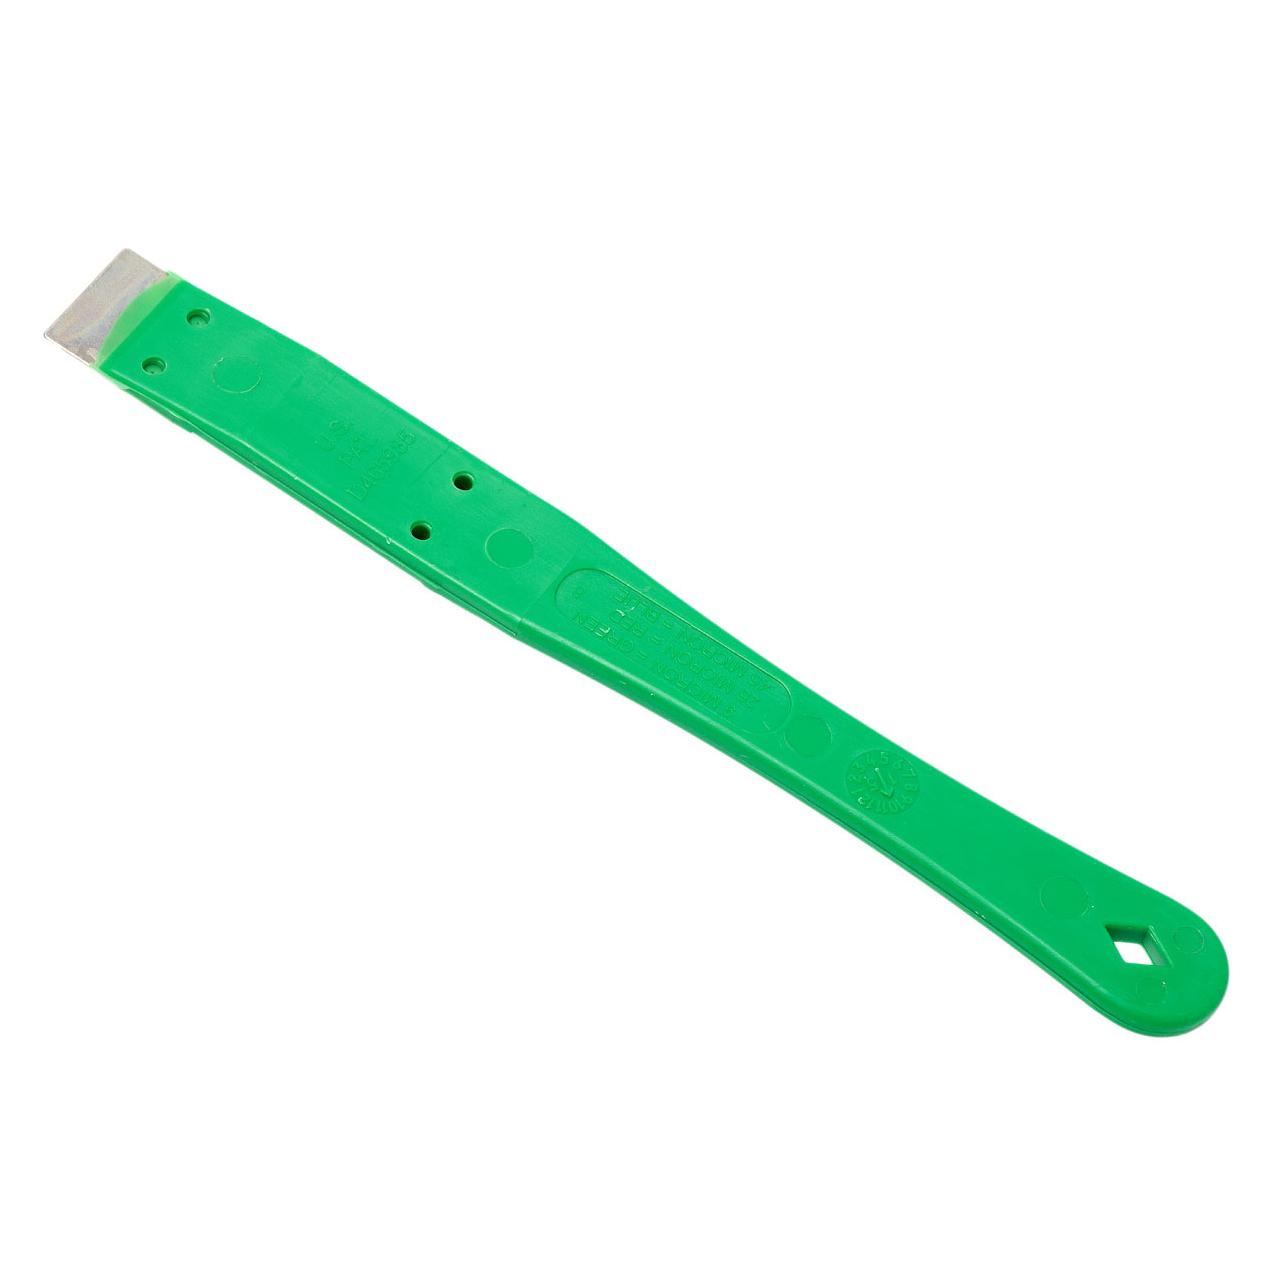 Фото 7 - Алмазная точилка для ножей DMT® Extra-Fine,  1200 mesh, 9 micron от DMT® Diamond Machining Technology